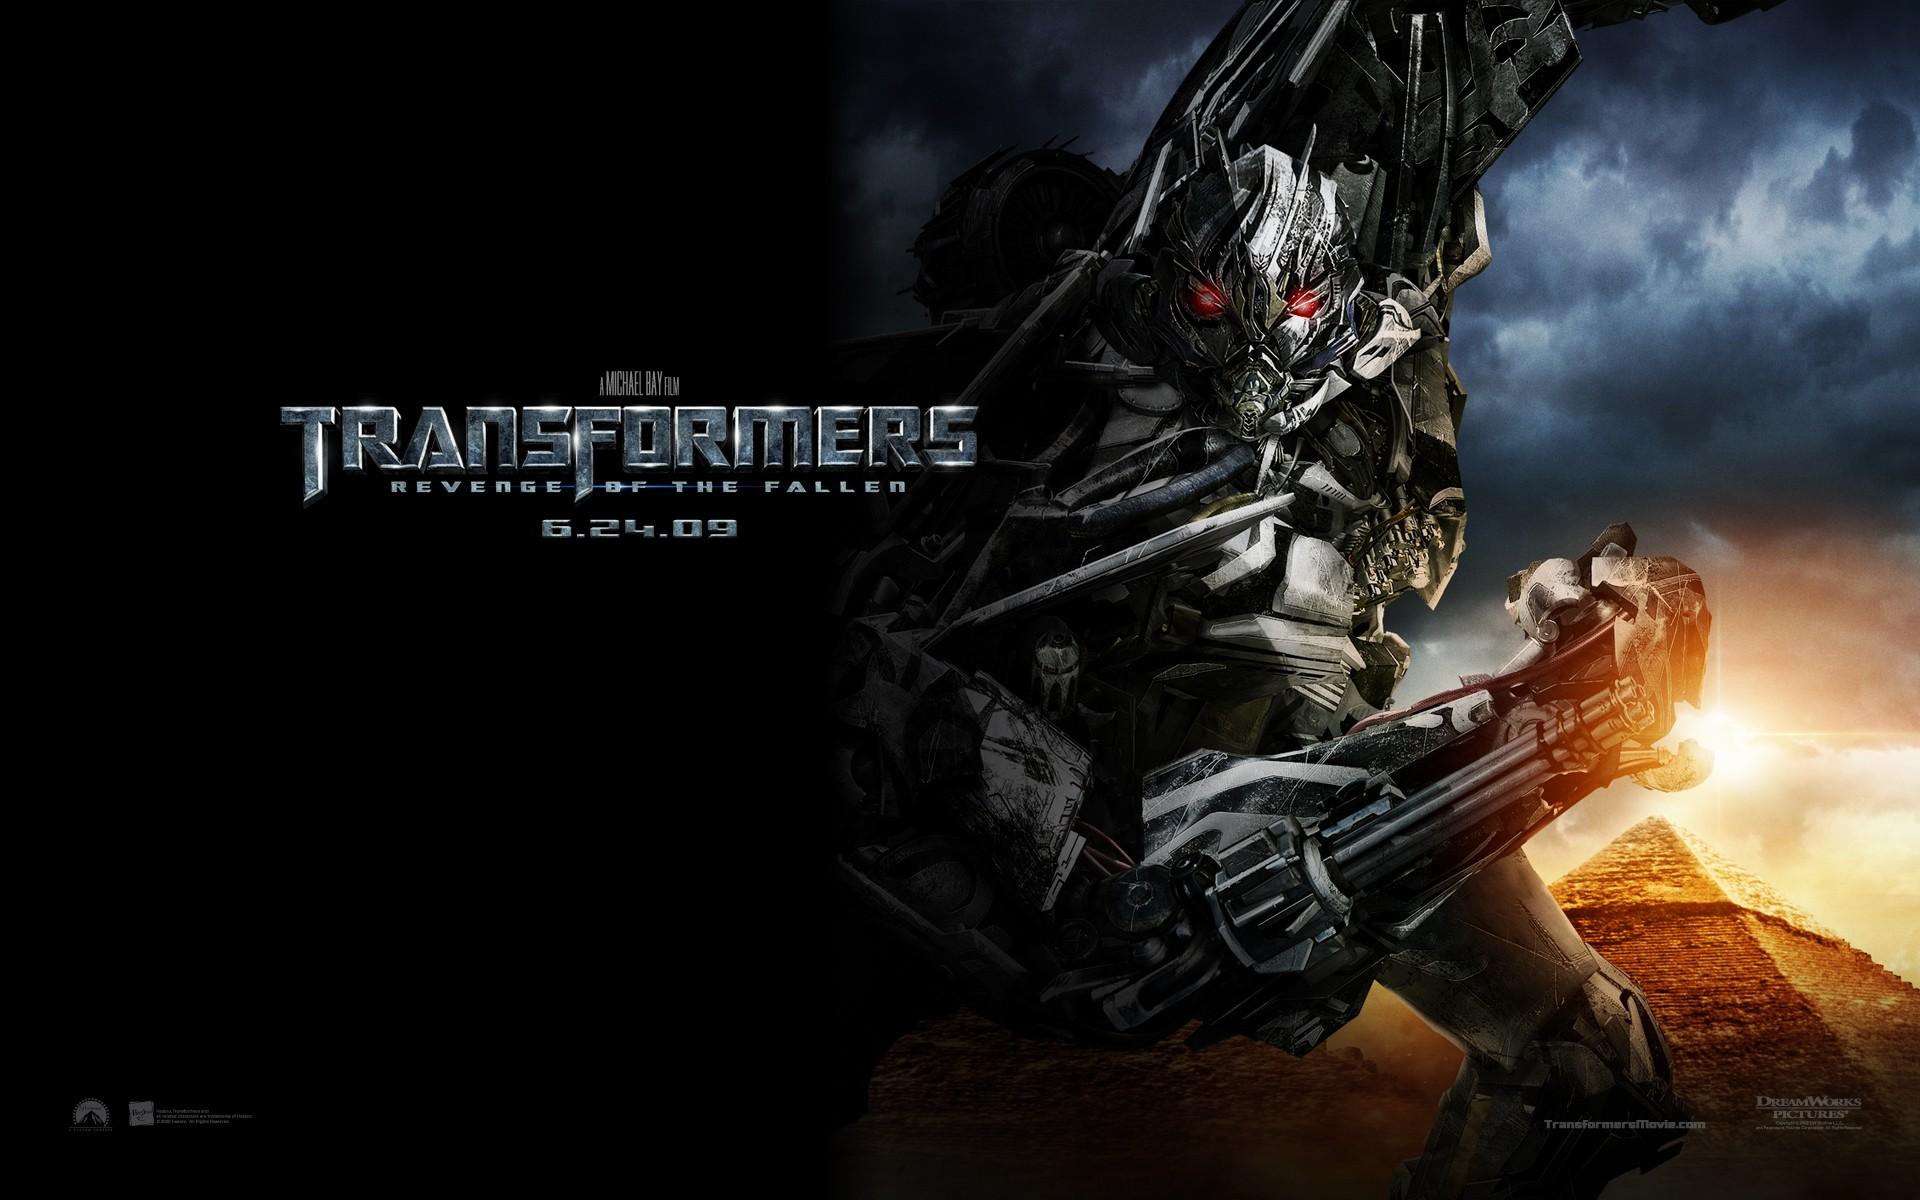 Un wallpaper del film Transformers - La vendetta del caduto, con Megatron